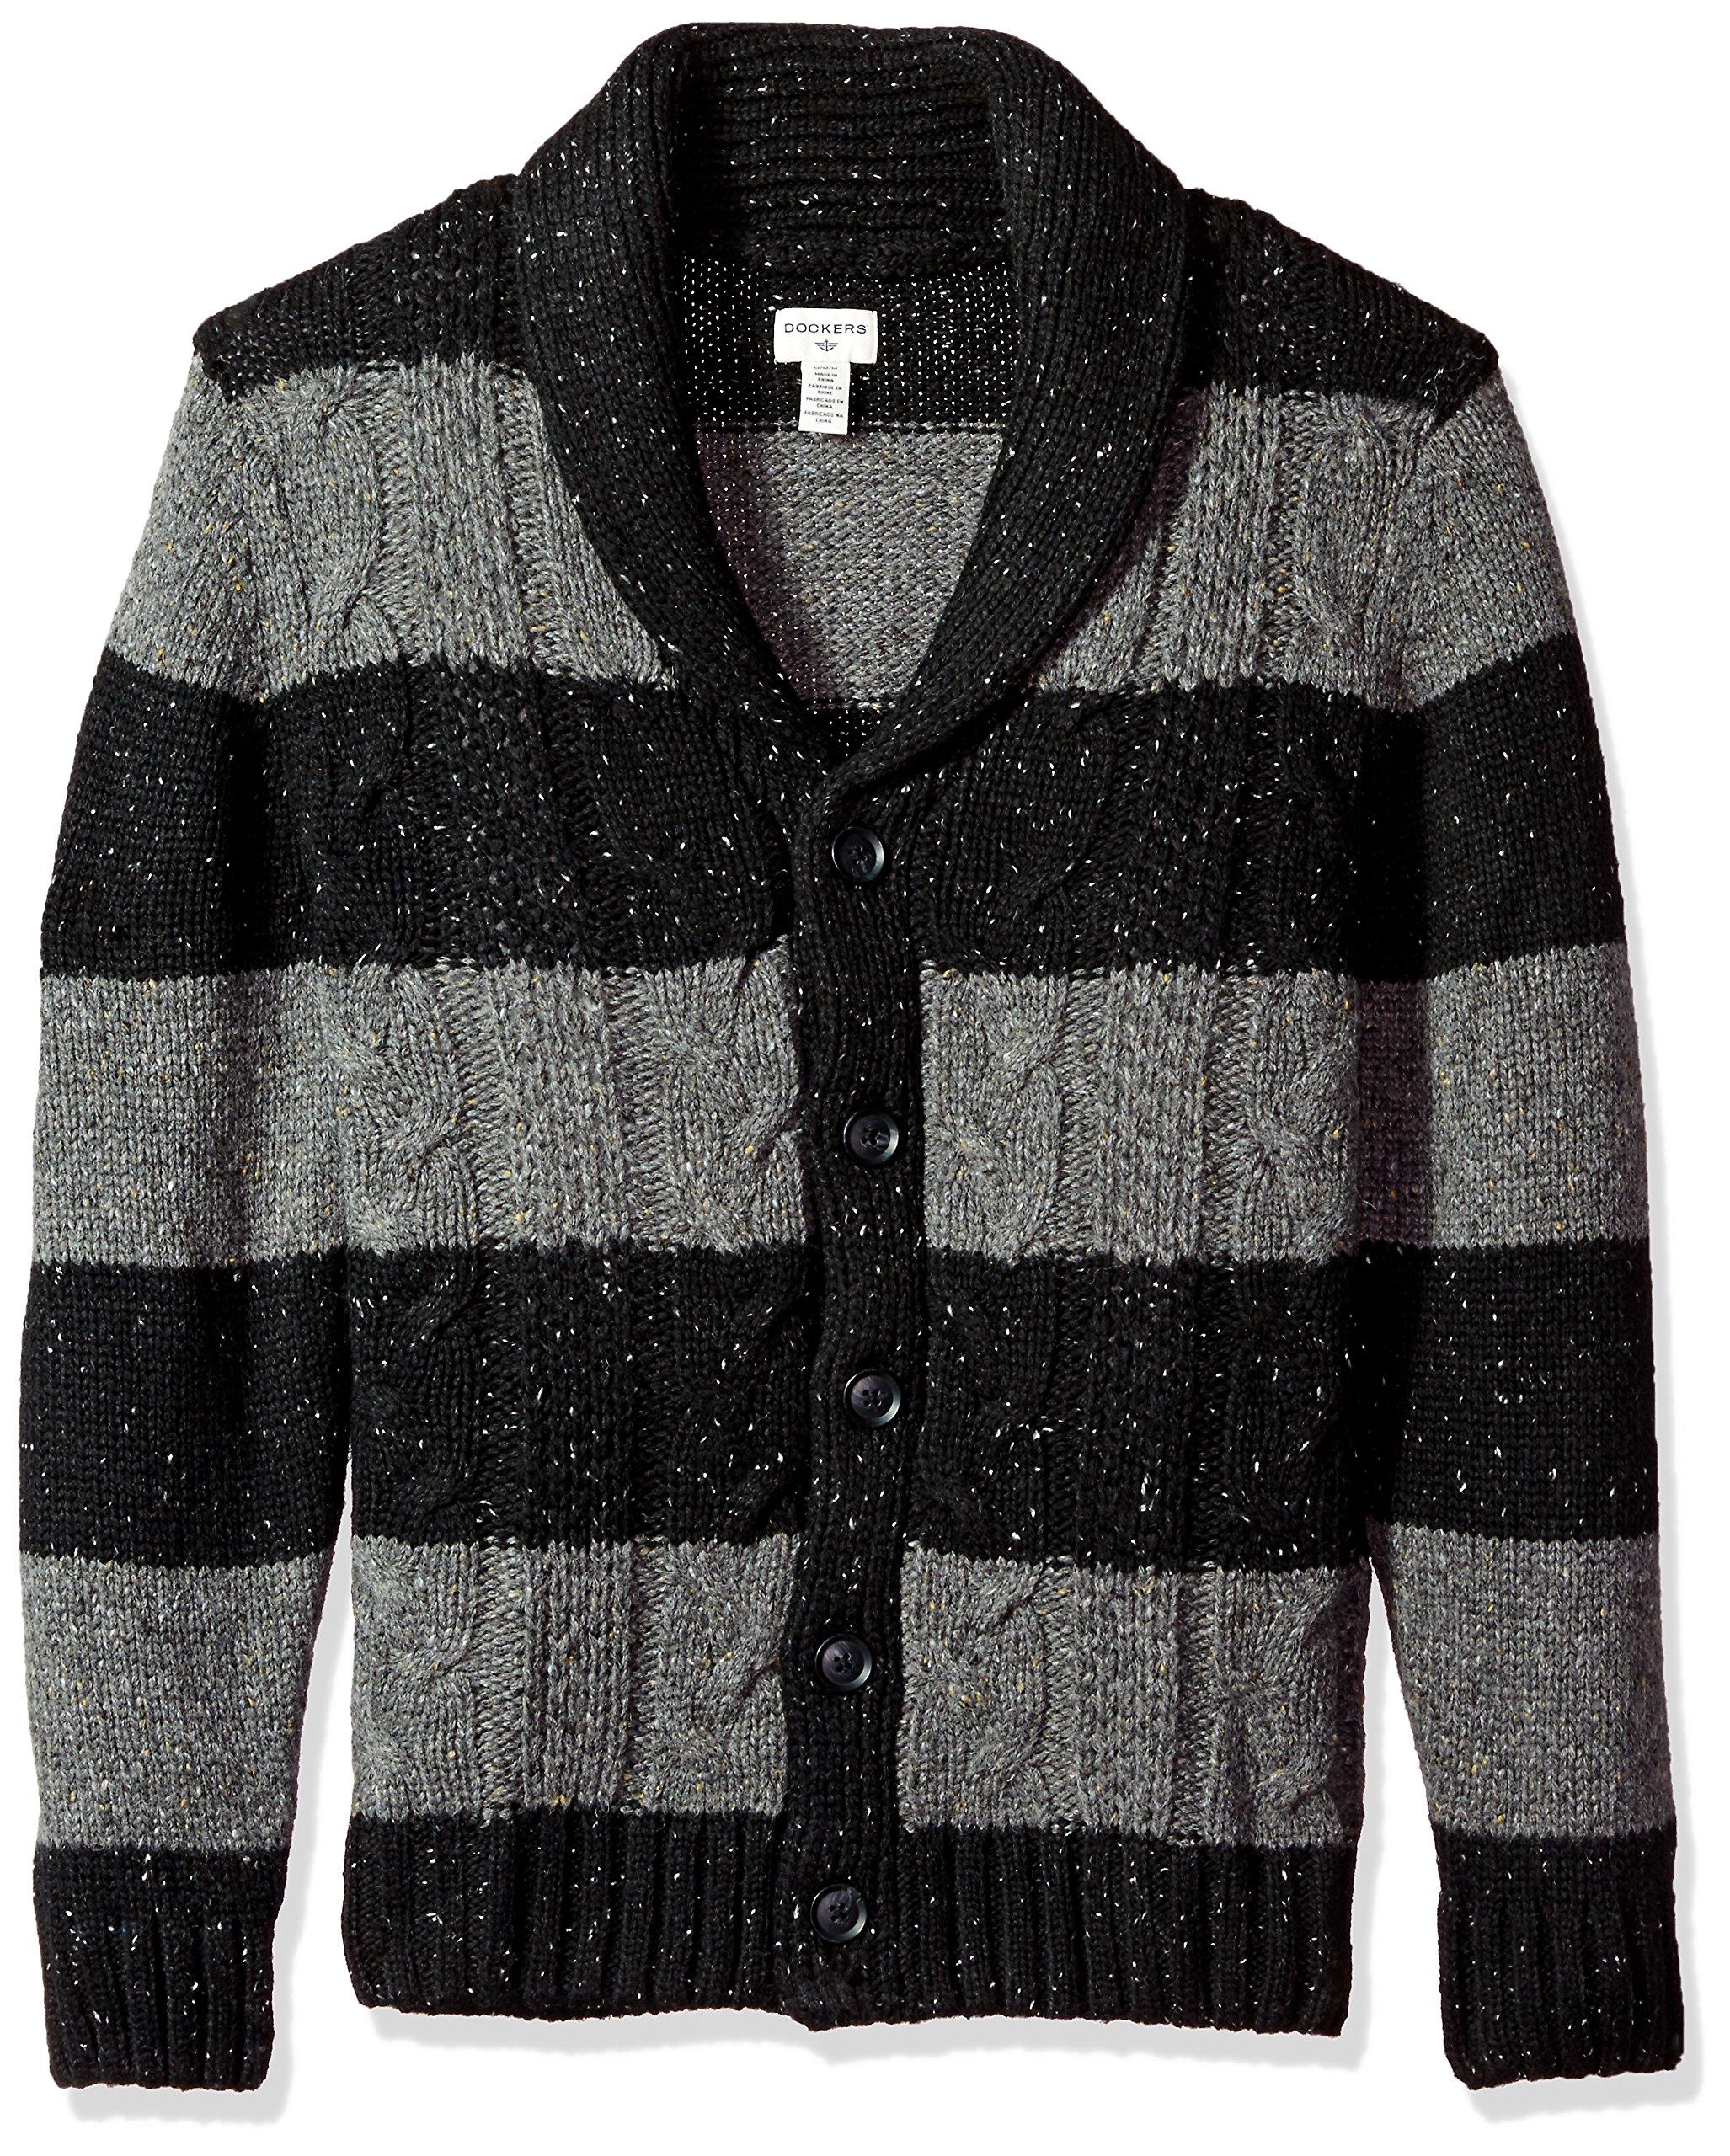 Dockers Men's Big and Tall Shawl Collar Button Front Cardigan, Black, Medium